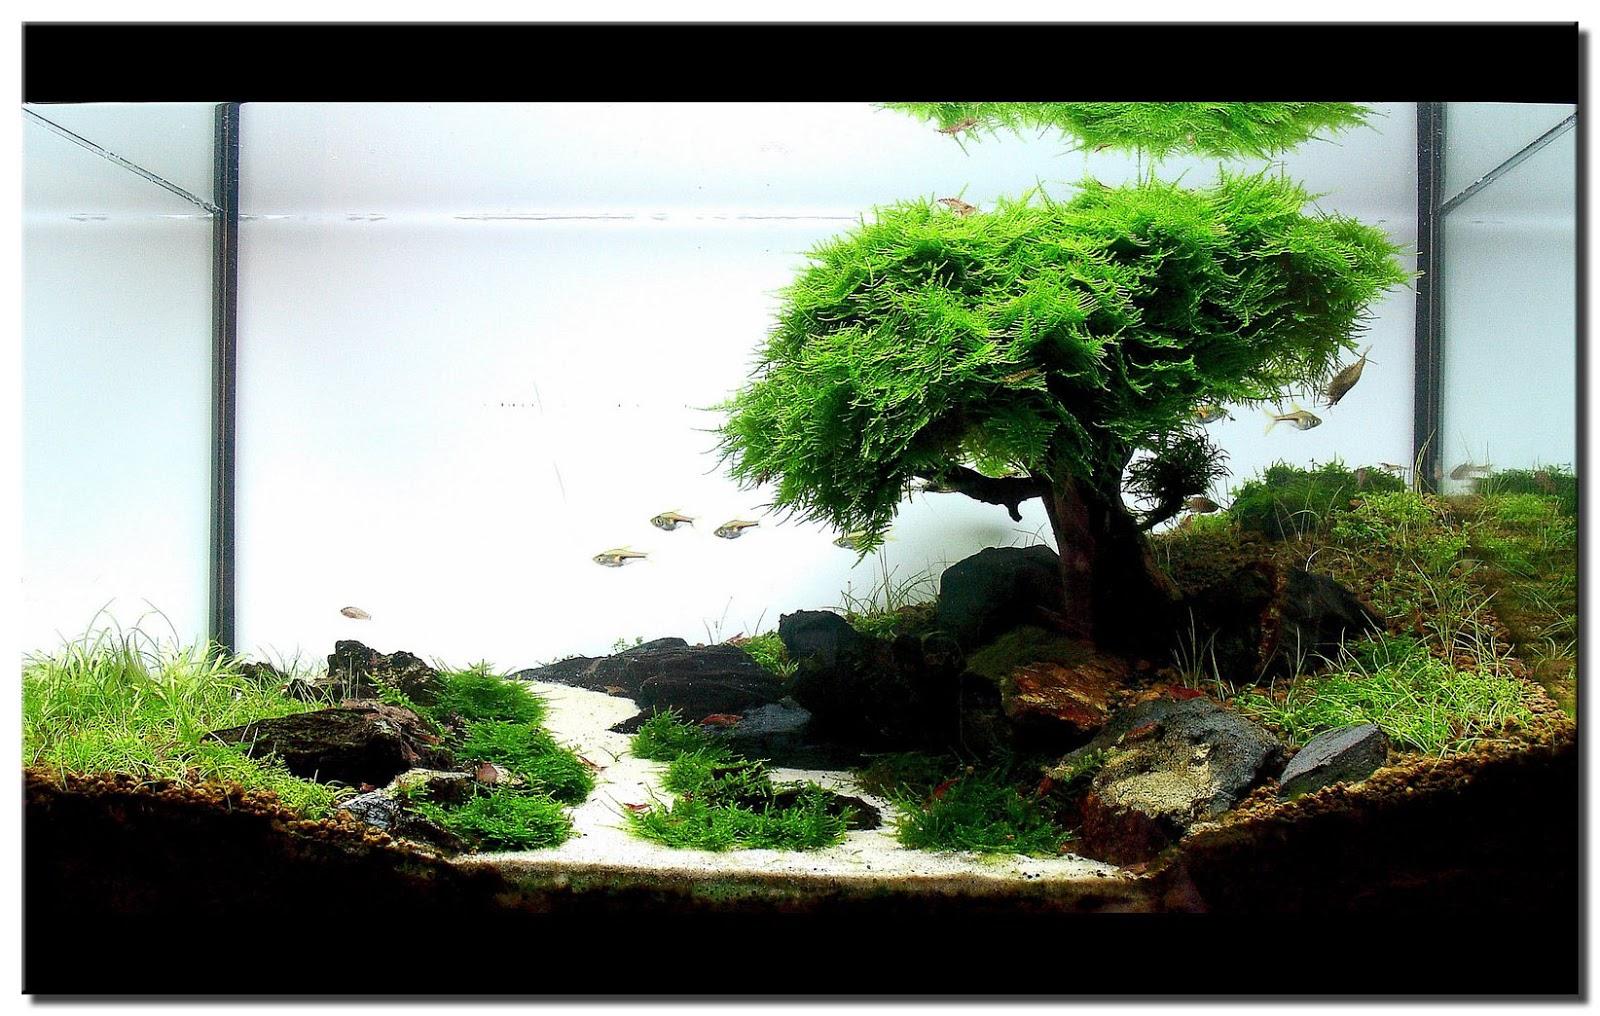 Aquarium Aquascape Pasir Silica Daftar Harga Terbaru Dan Malang Karungan Adalah Istilah Bercocok Tanam Dalam Airdimana Tanaman Hidup Di Air